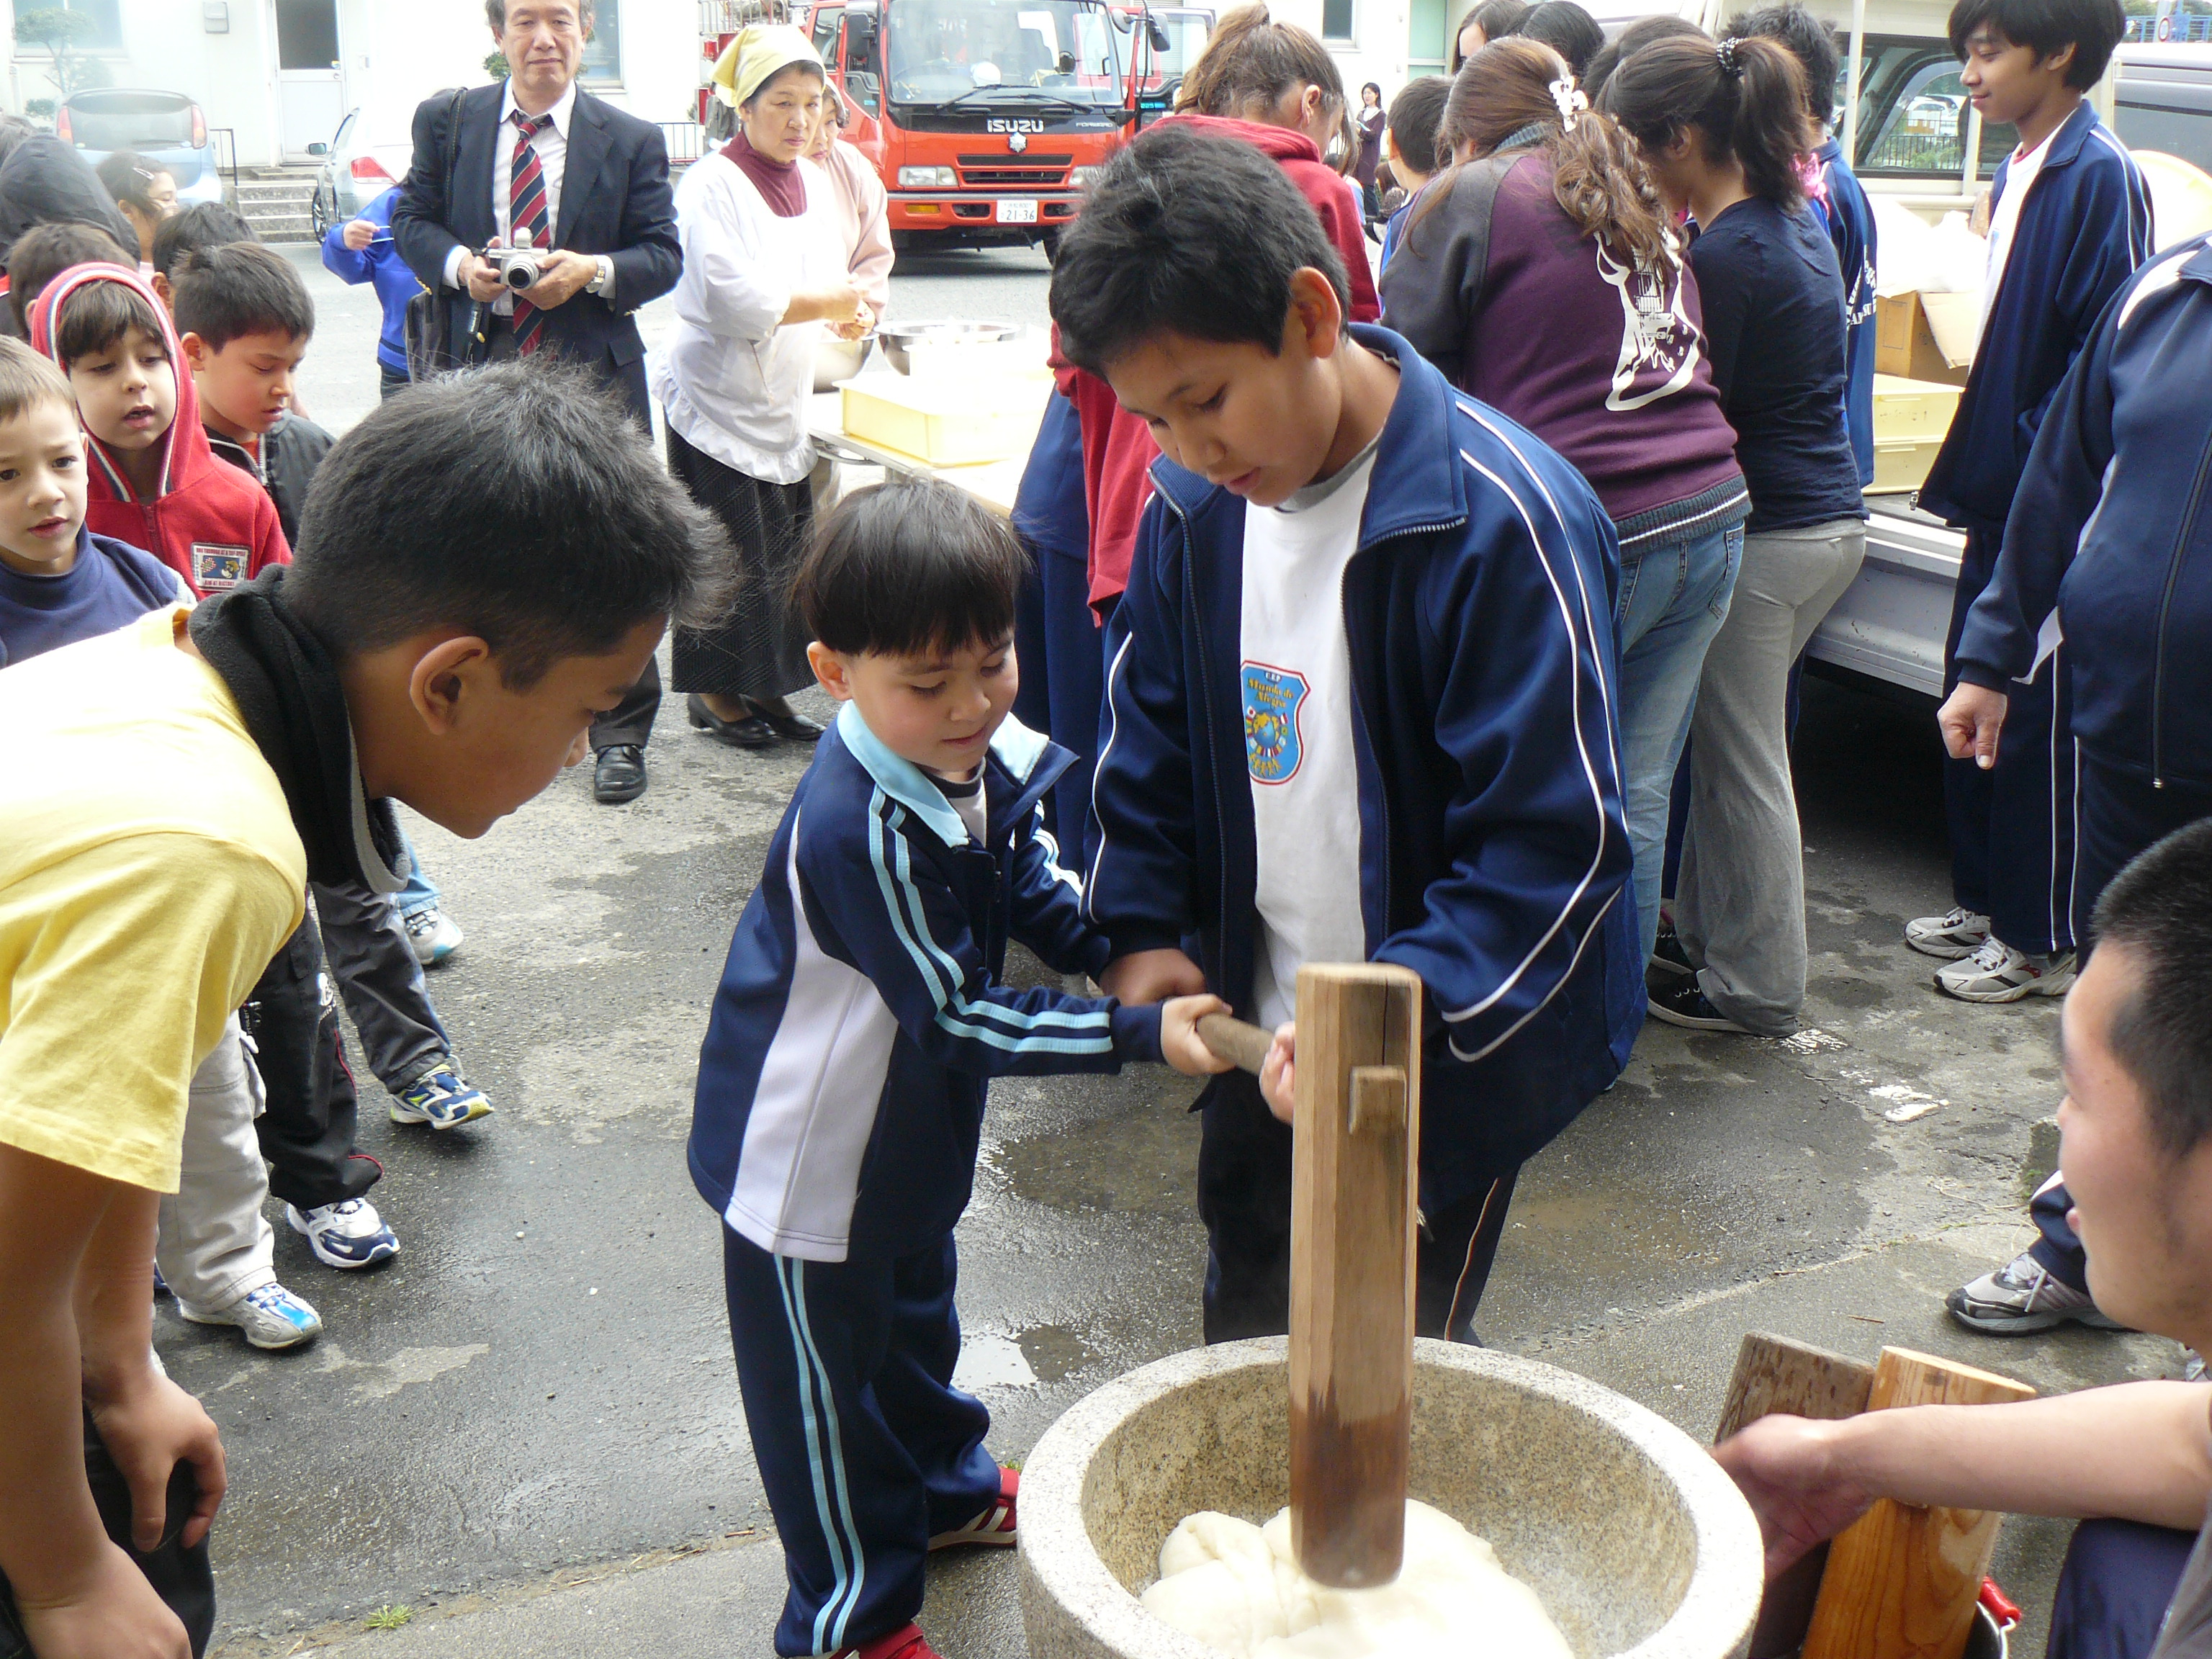 http://www.mundodealegria.org/images/P1020671.JPG